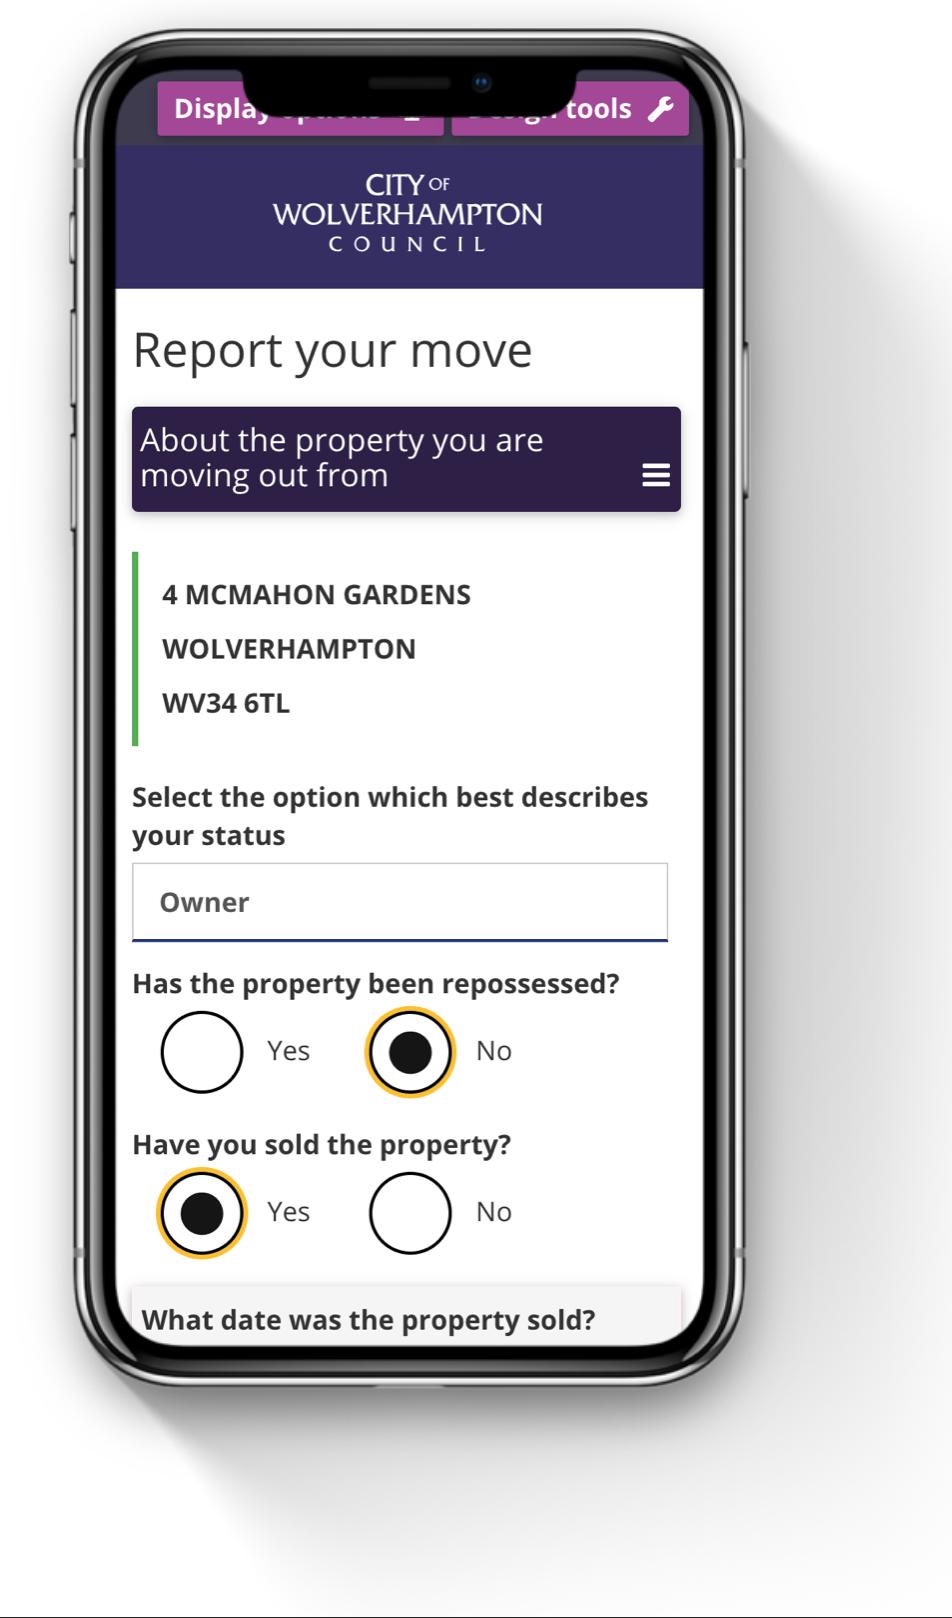 Report a move form